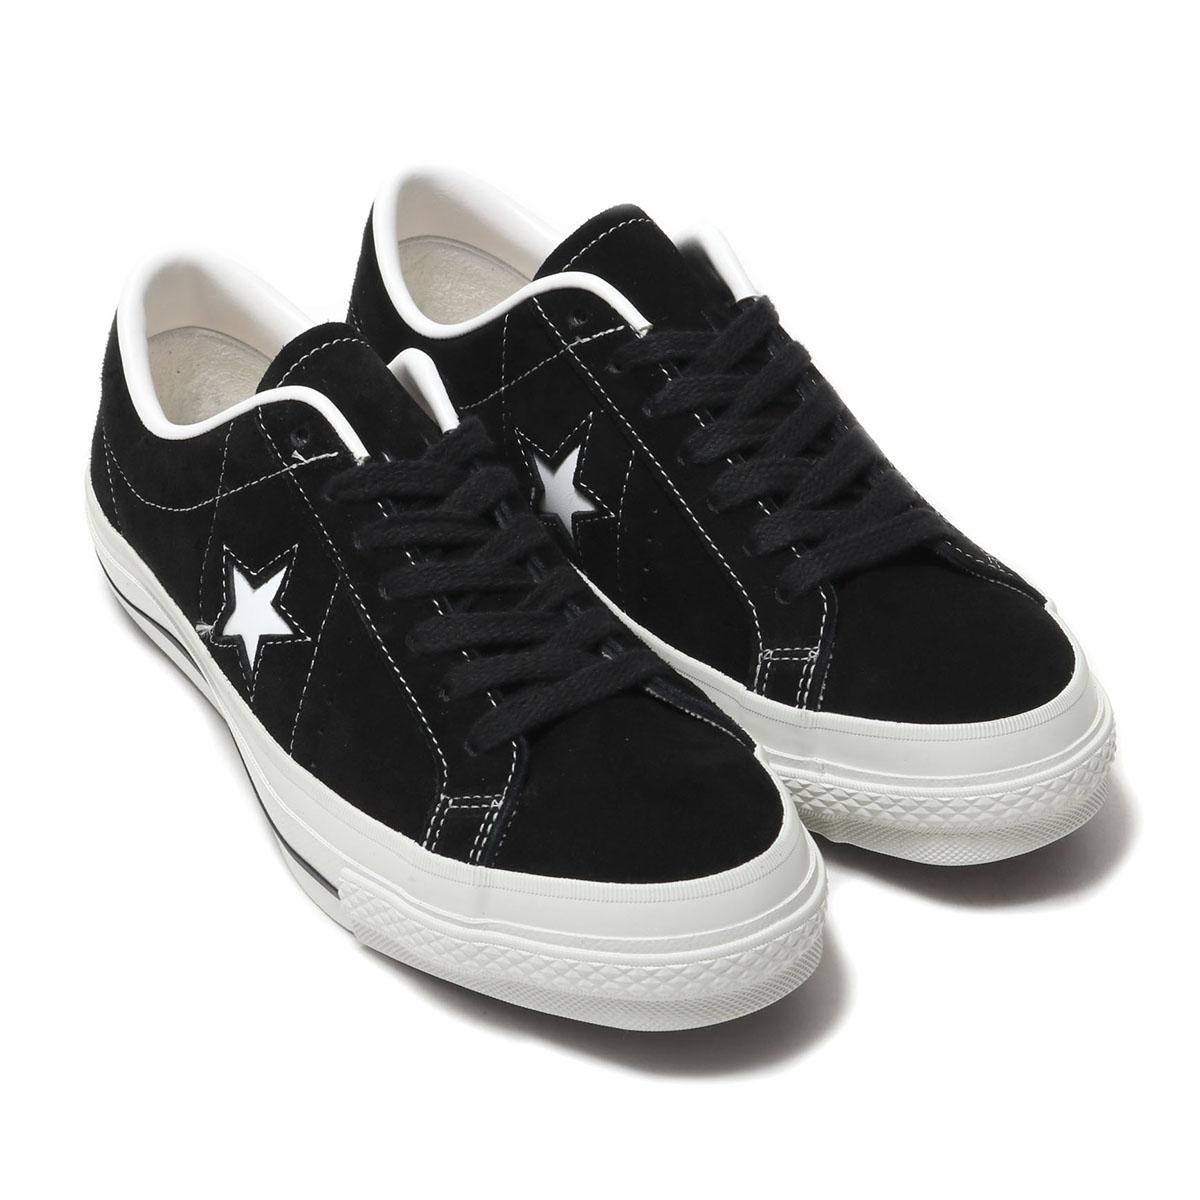 CONVERSE ONE STAR J SUEDE (コンバース ワンスター J スエード)ブラック【メンズ レディース スニーカー】19SS-I